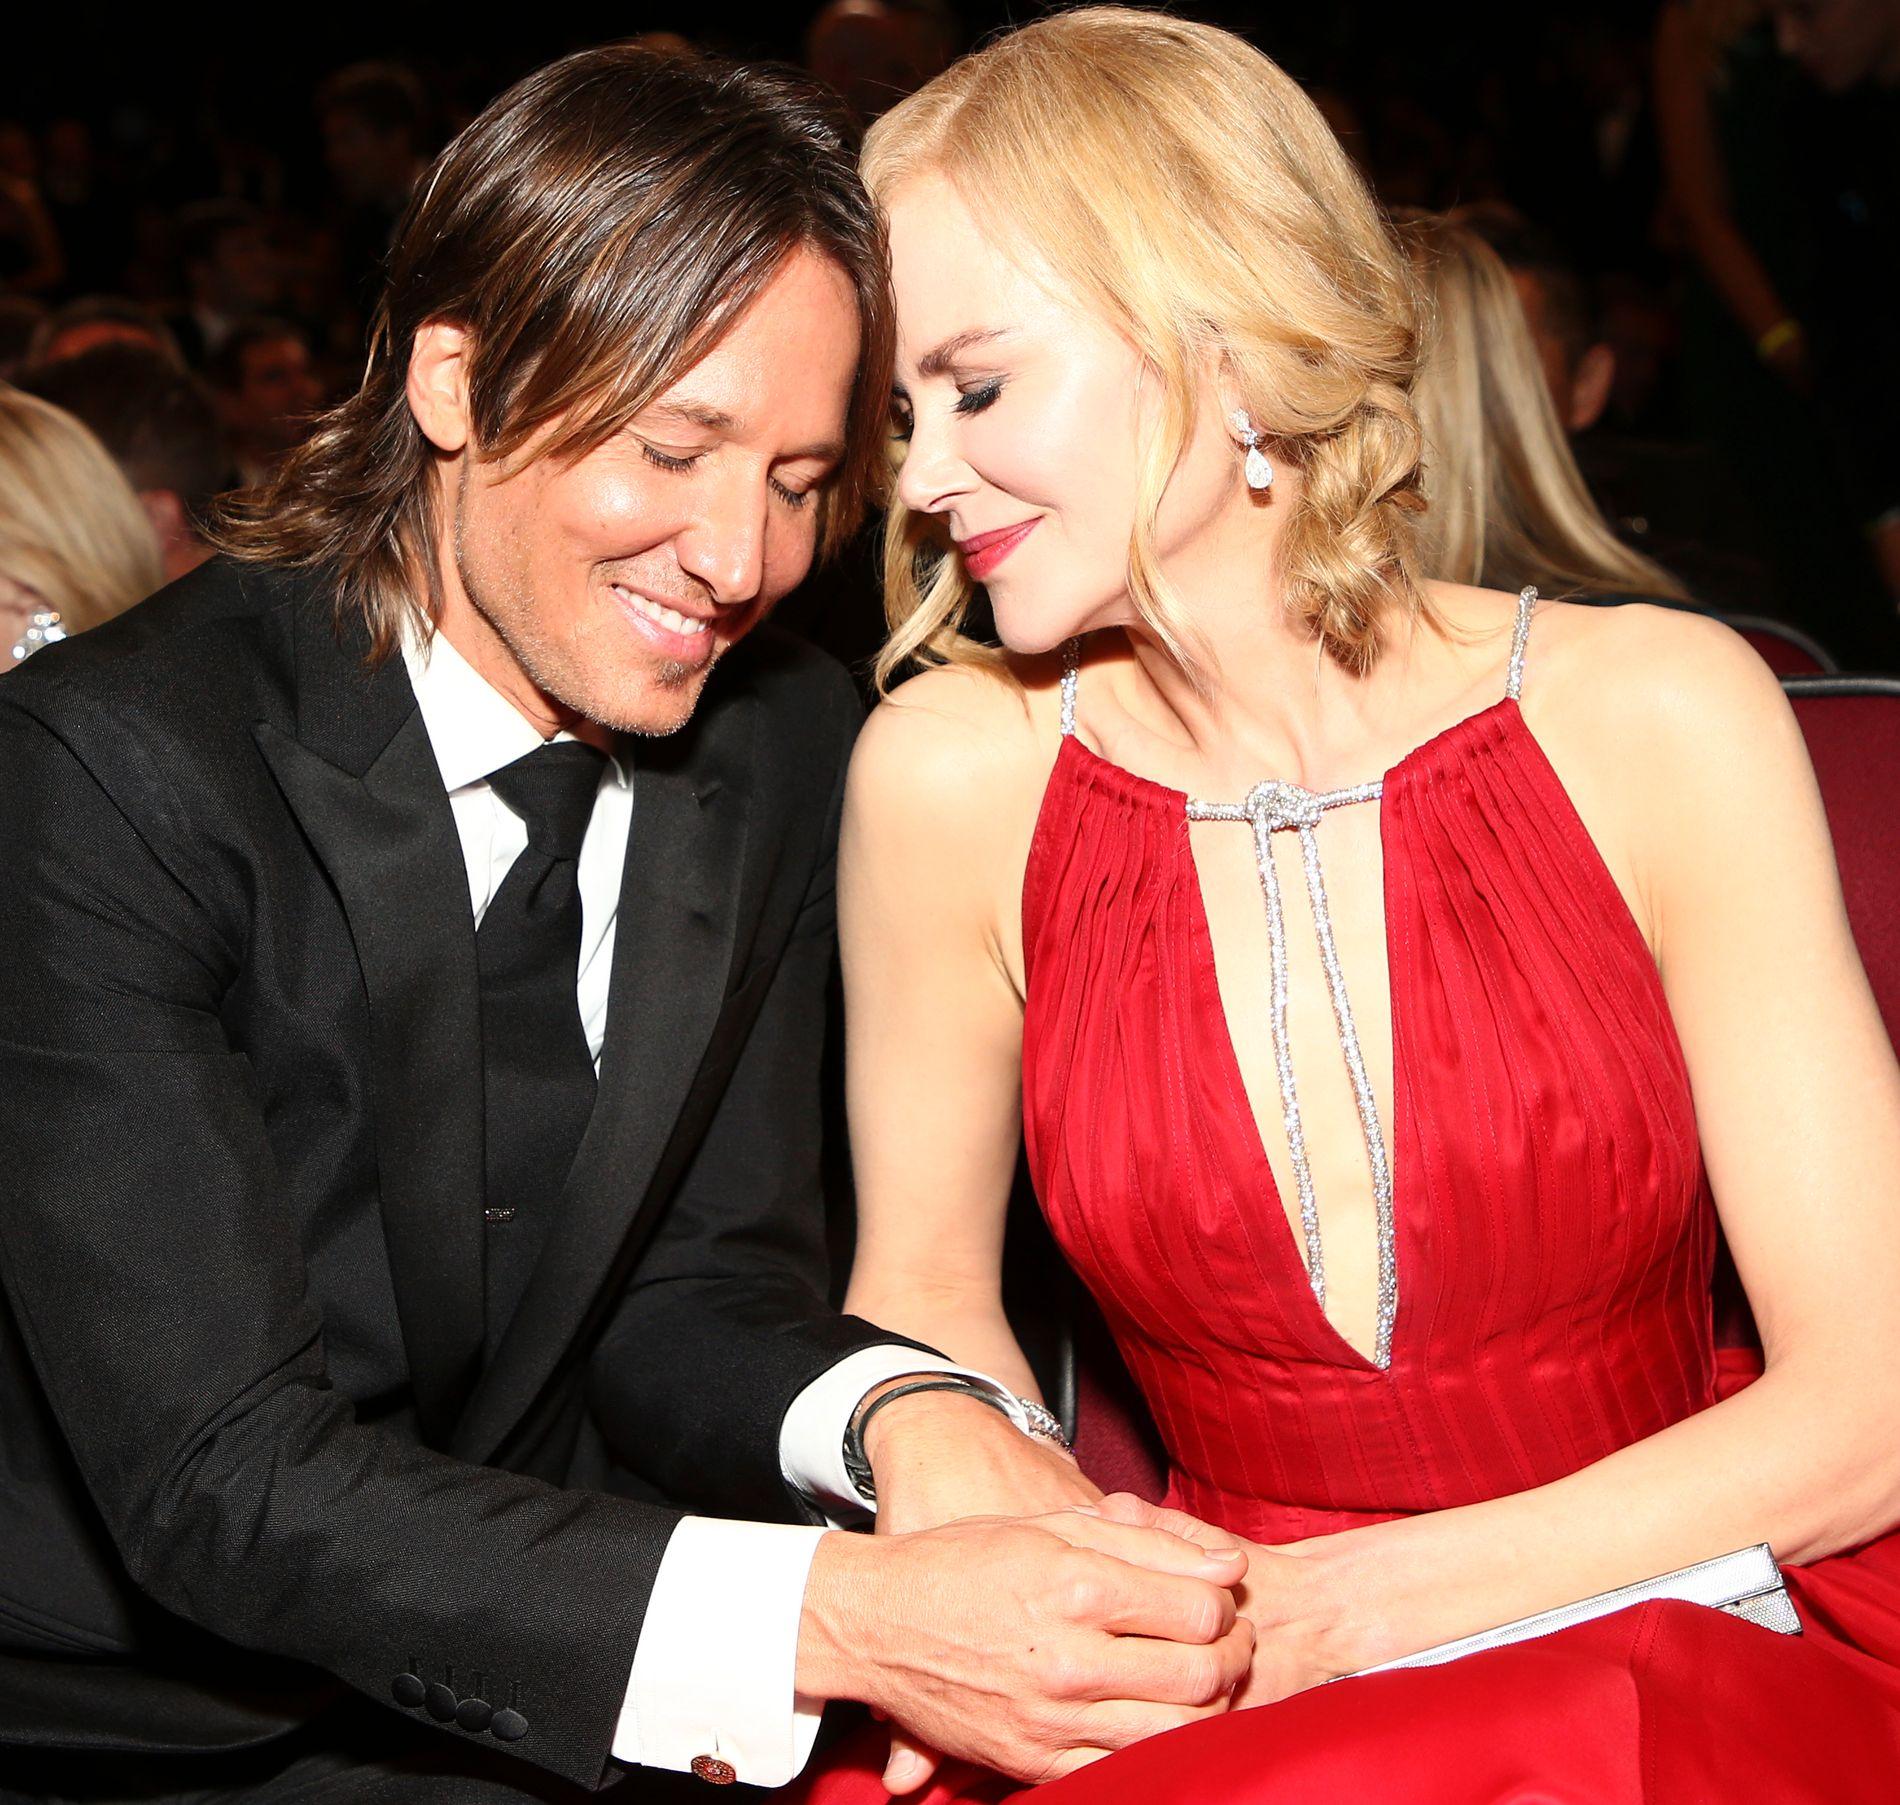 STJERNEPAR: Keith Urban og Nicole Kidman på Emmy Awards i september.